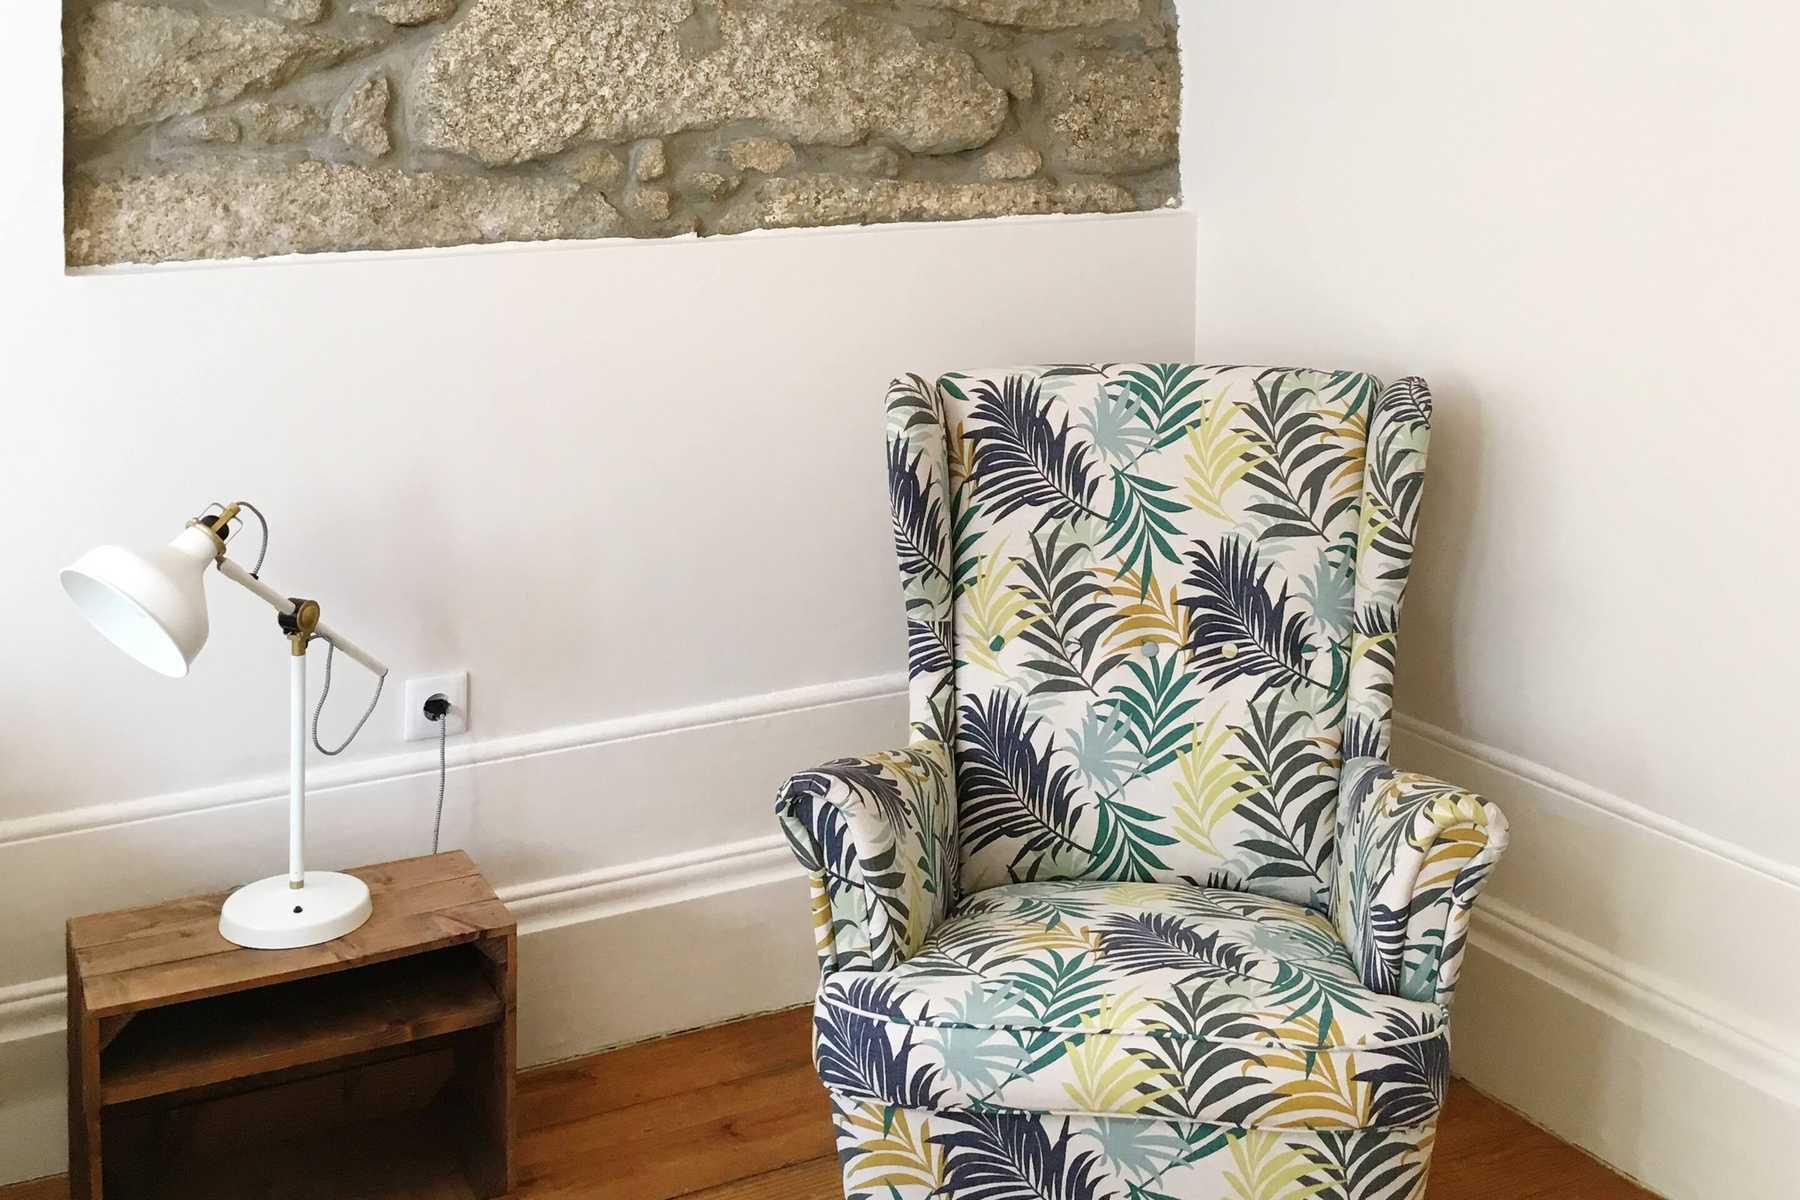 limpieza-de-muebles - limpieza de muebles de cuero